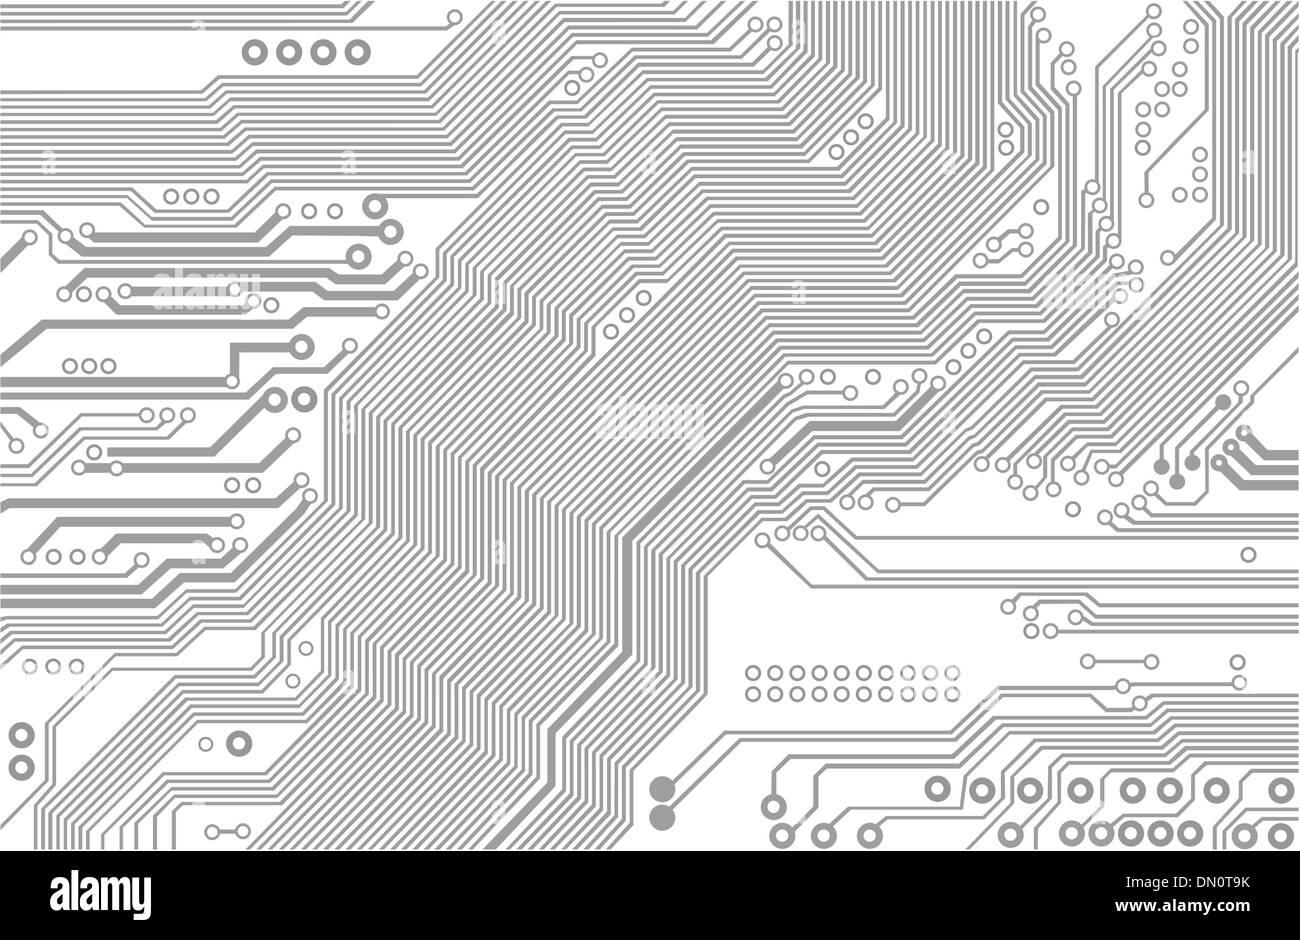 Motherboard Circuit Illustration: Vector Stock Vector Art